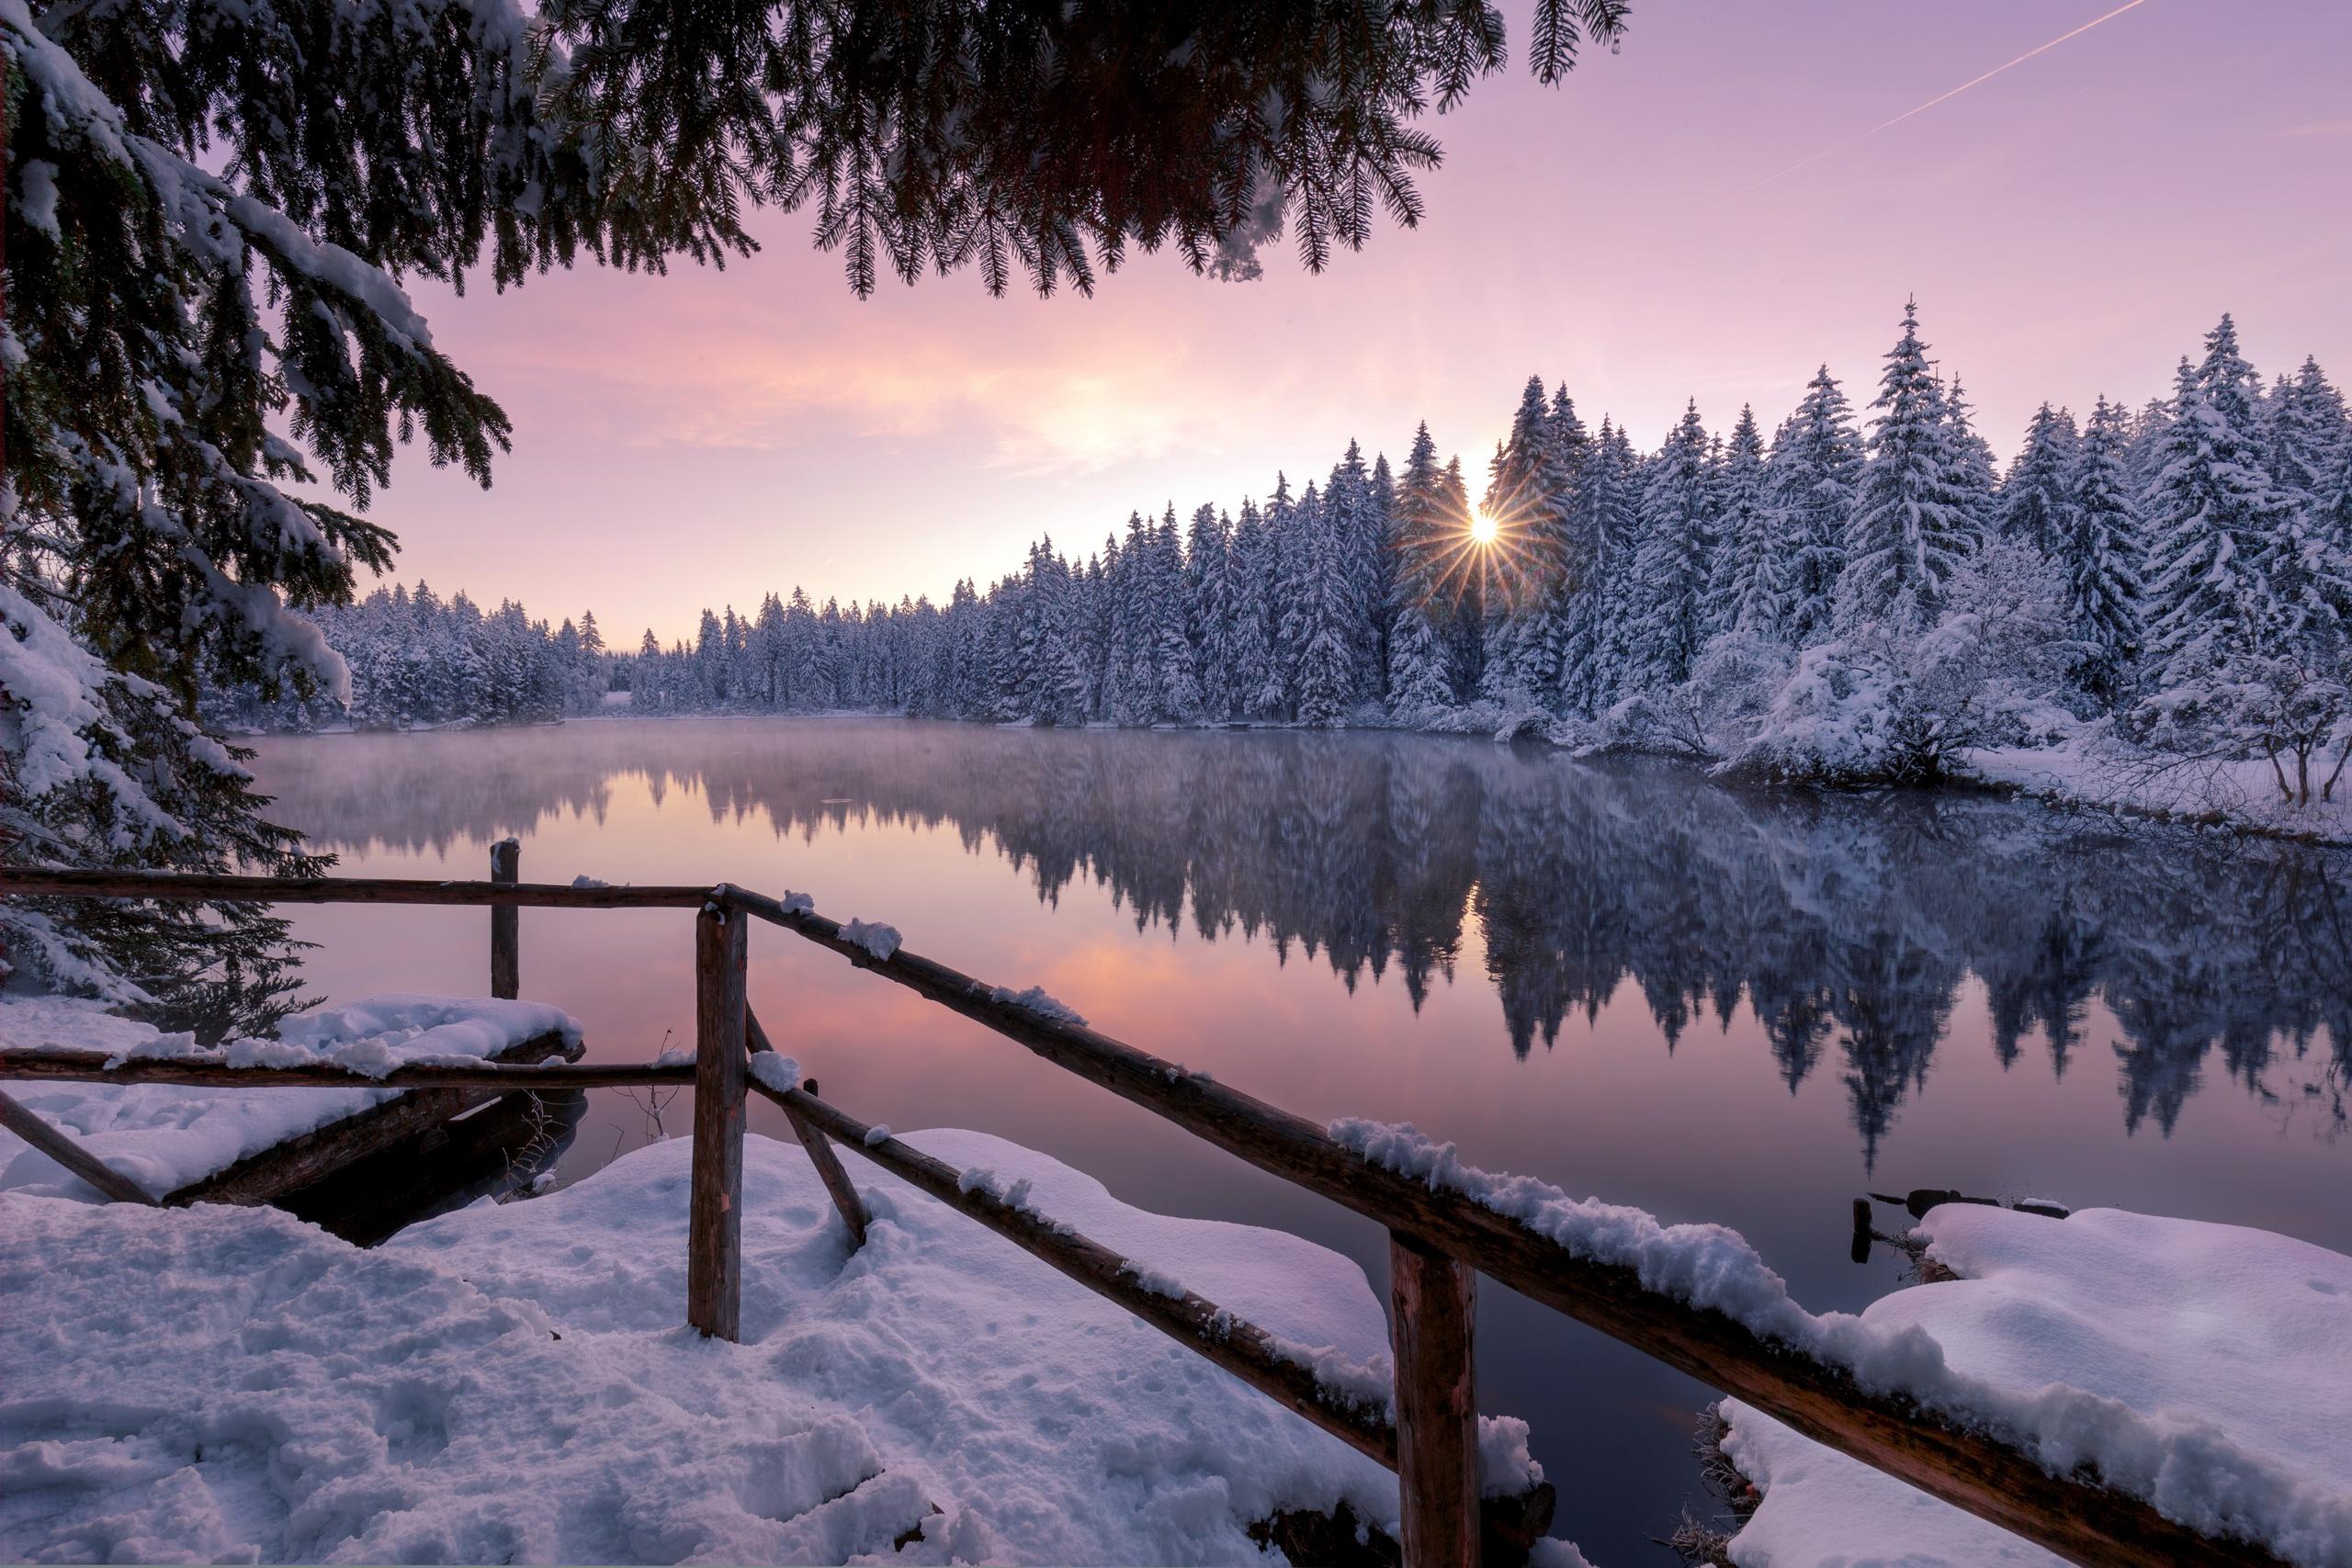 Lac Fond Ecran Hd